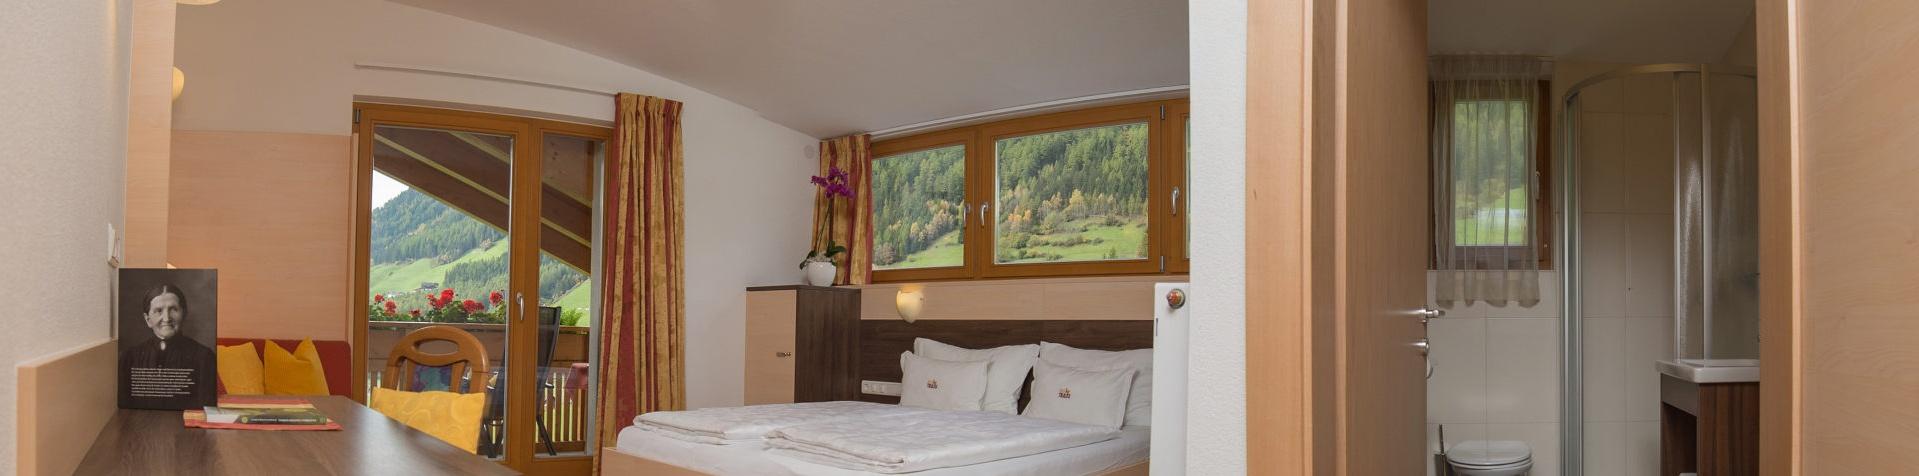 Talblick-Suedtirol-Wandern